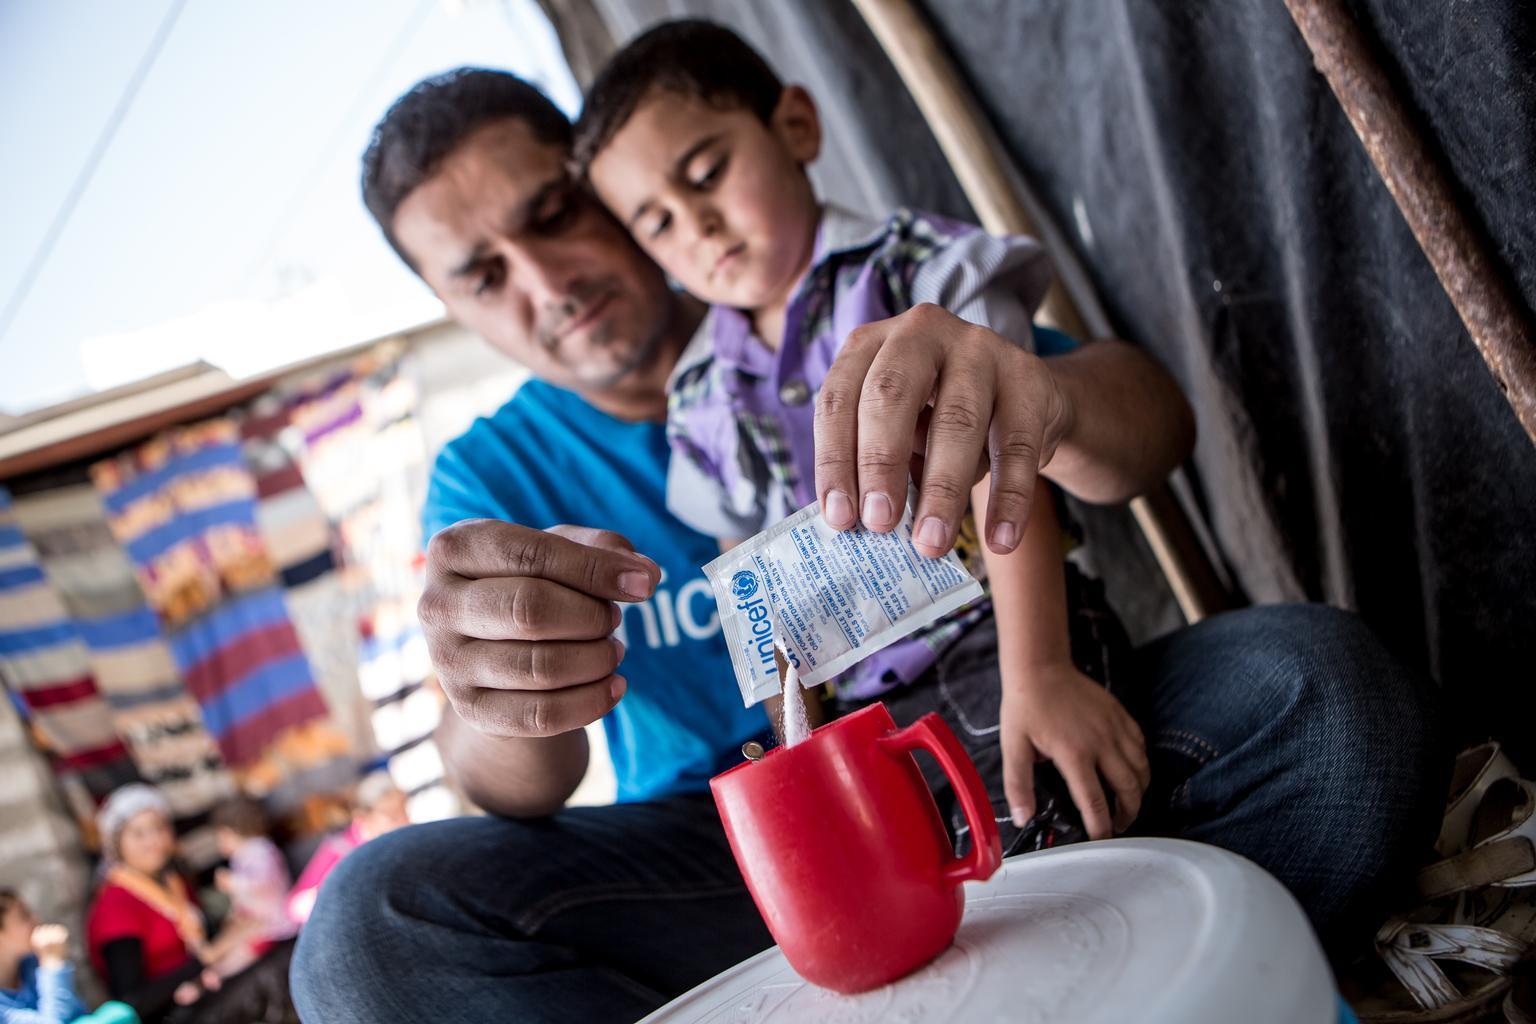 © UNICEF/UKLA2013-00915/Schermbrucker